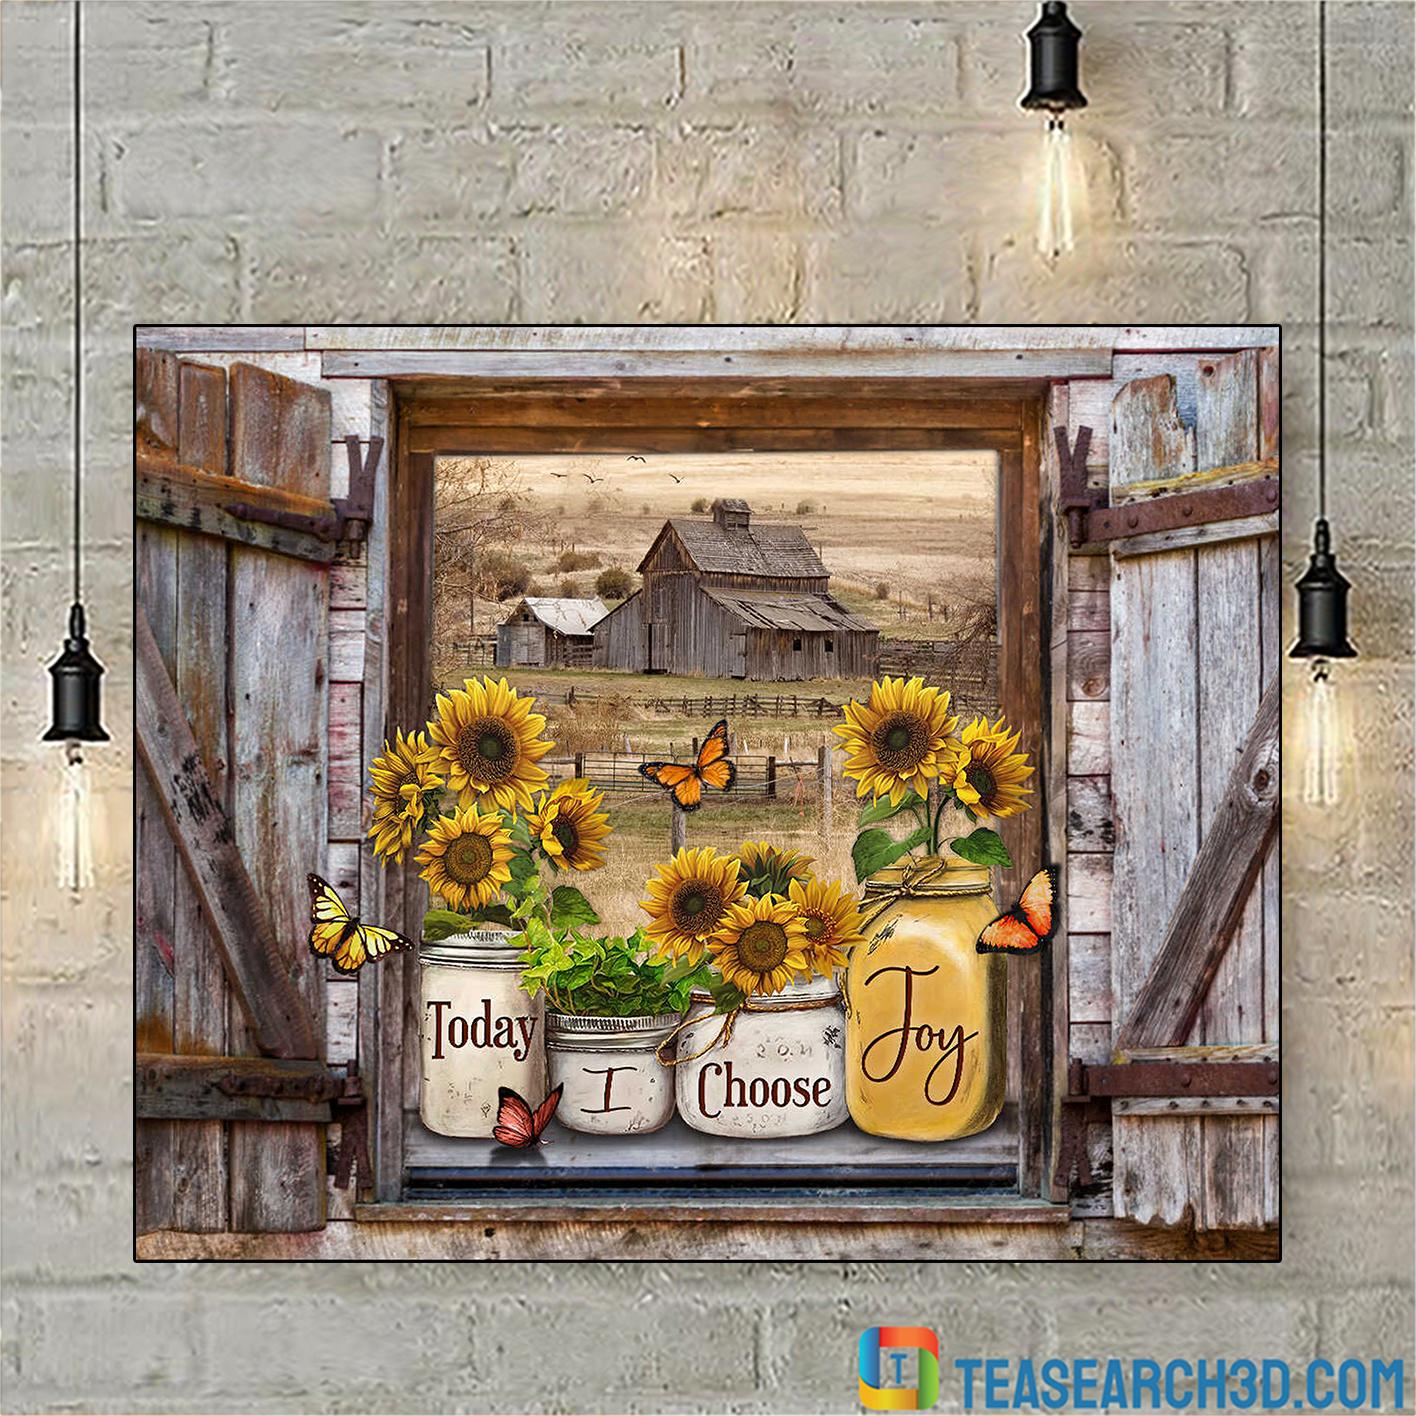 Butterflies sunflower mason jars on rustic window sill barn view today I choose joy canvas small